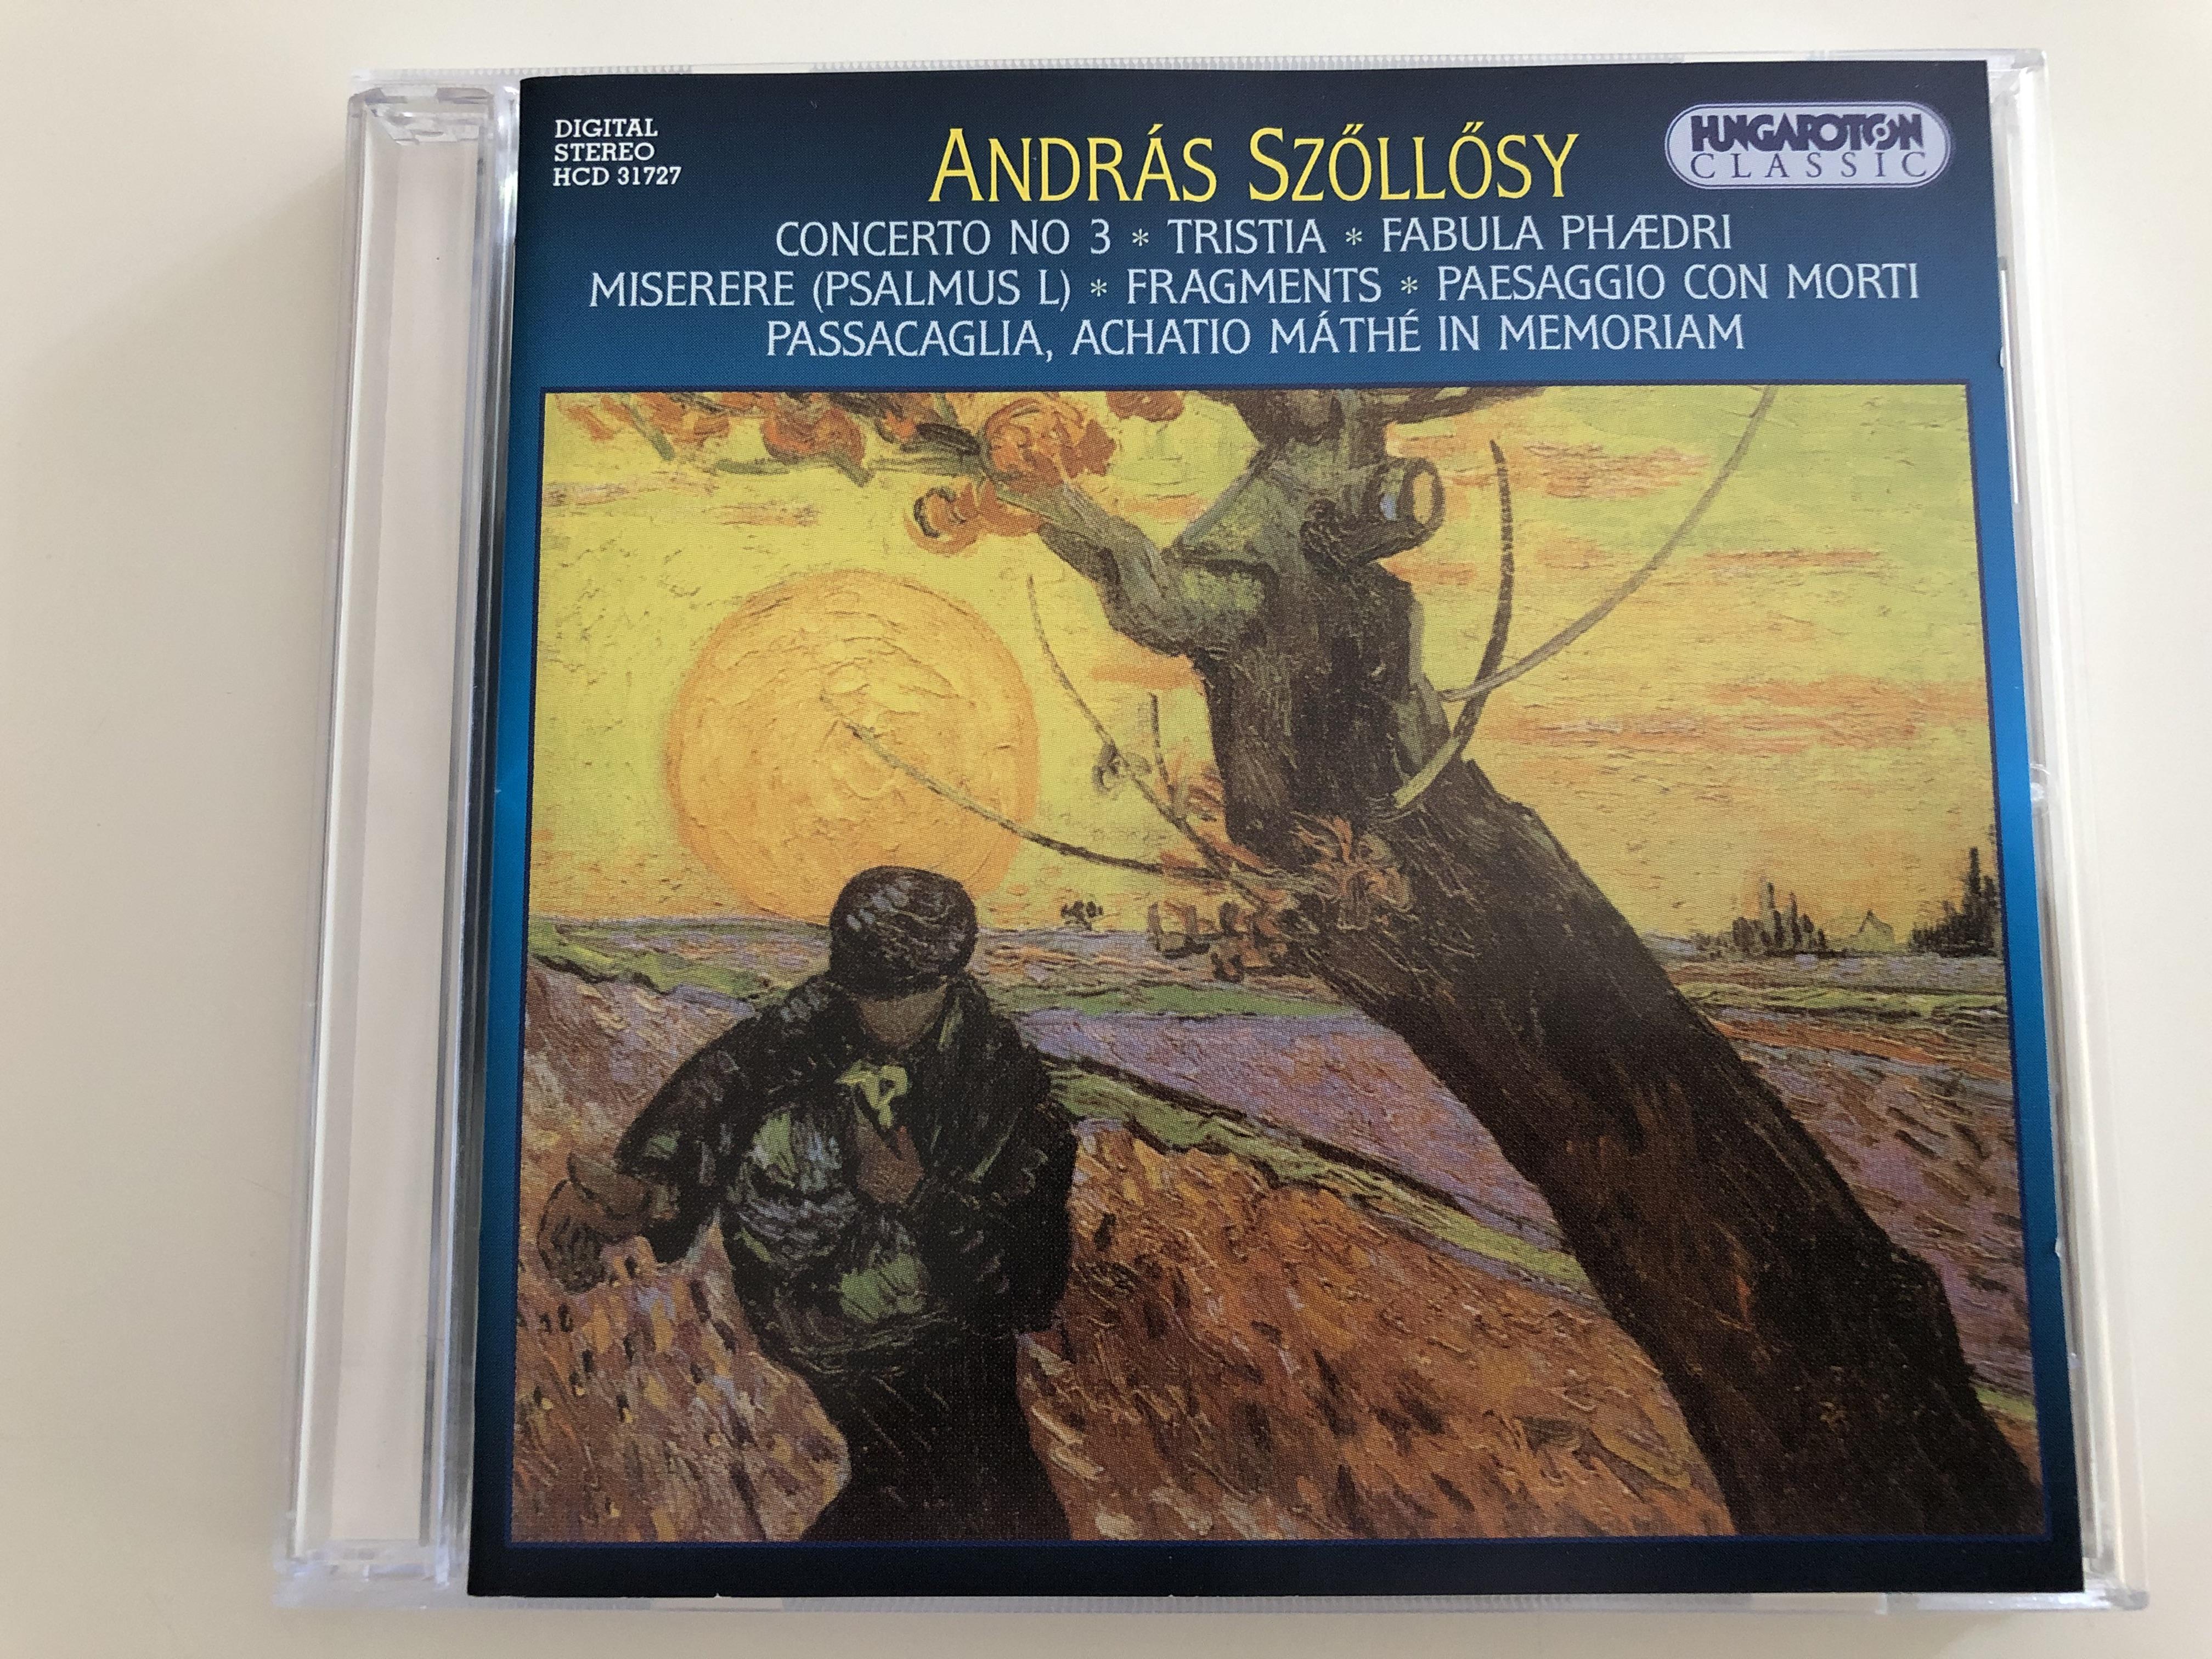 andr-s-sz-ll-sy-concerto-no-3-tristia-fabula-ph-dri-miserere-psalmus-l-hungaroton-classic-audio-cd-2002-hcd-31727-1-.jpg